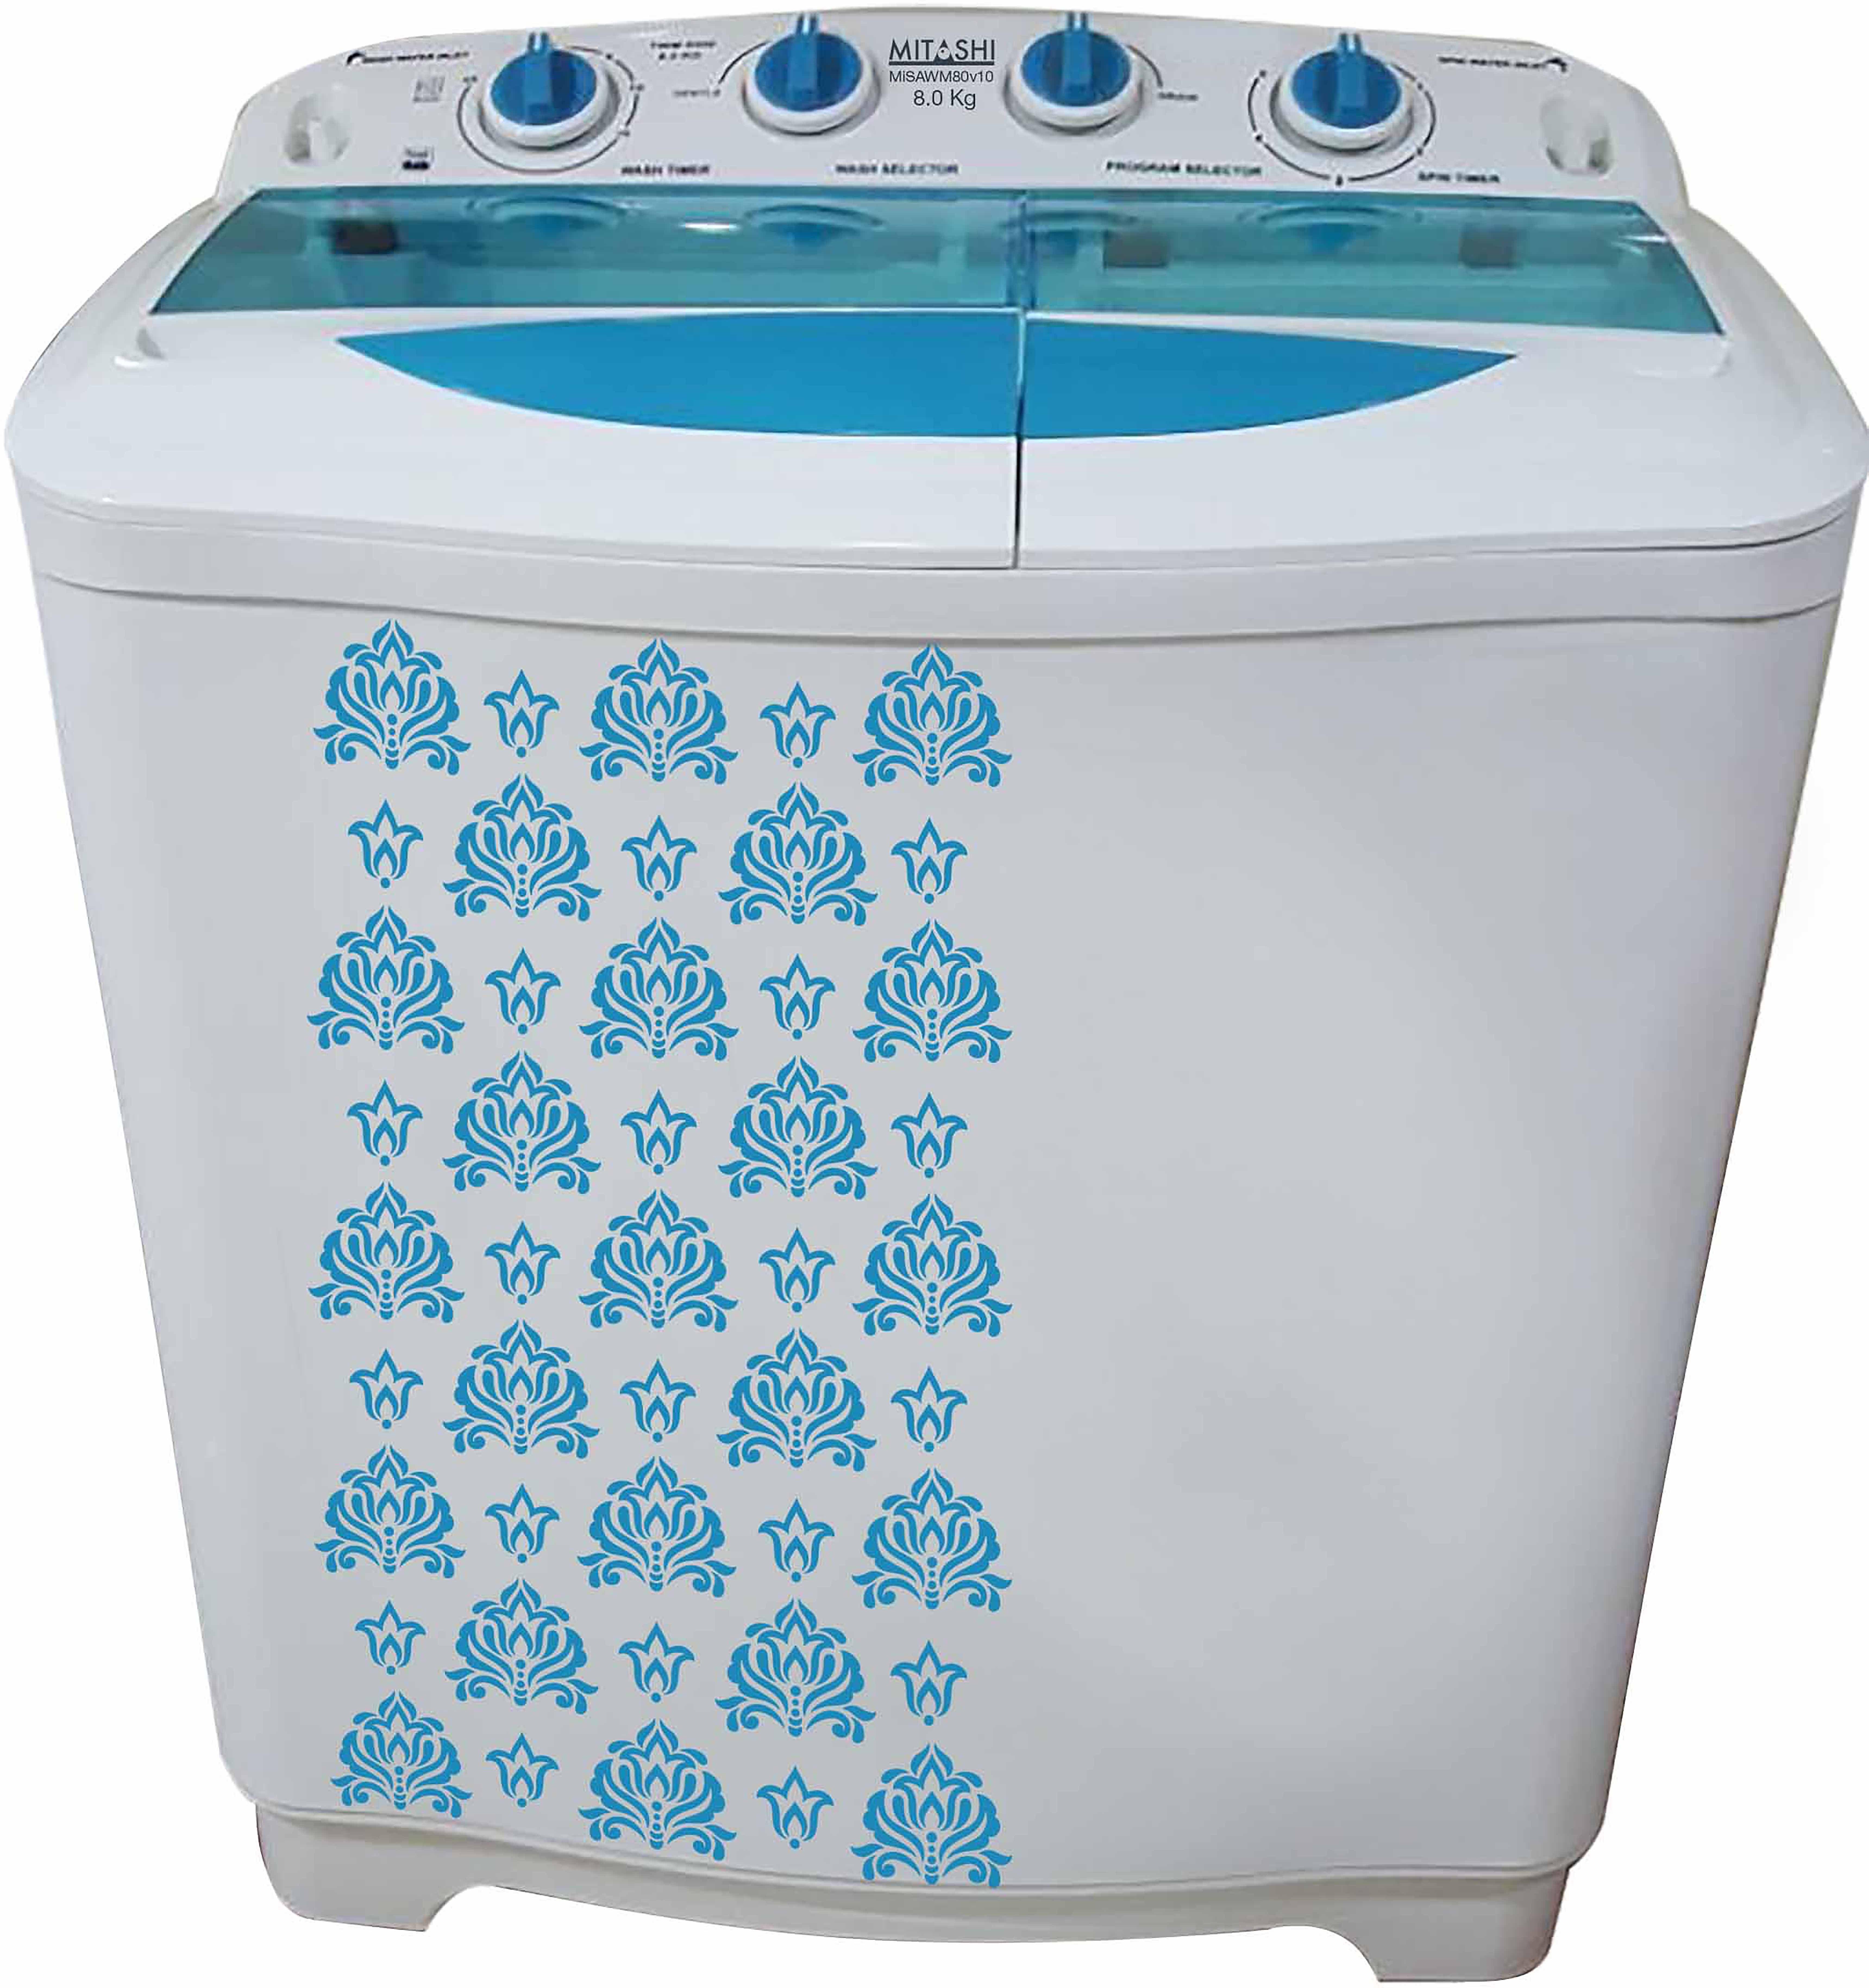 MITASHI MISAWM80V 8KG Semi Automatic Top Load Washing Machine